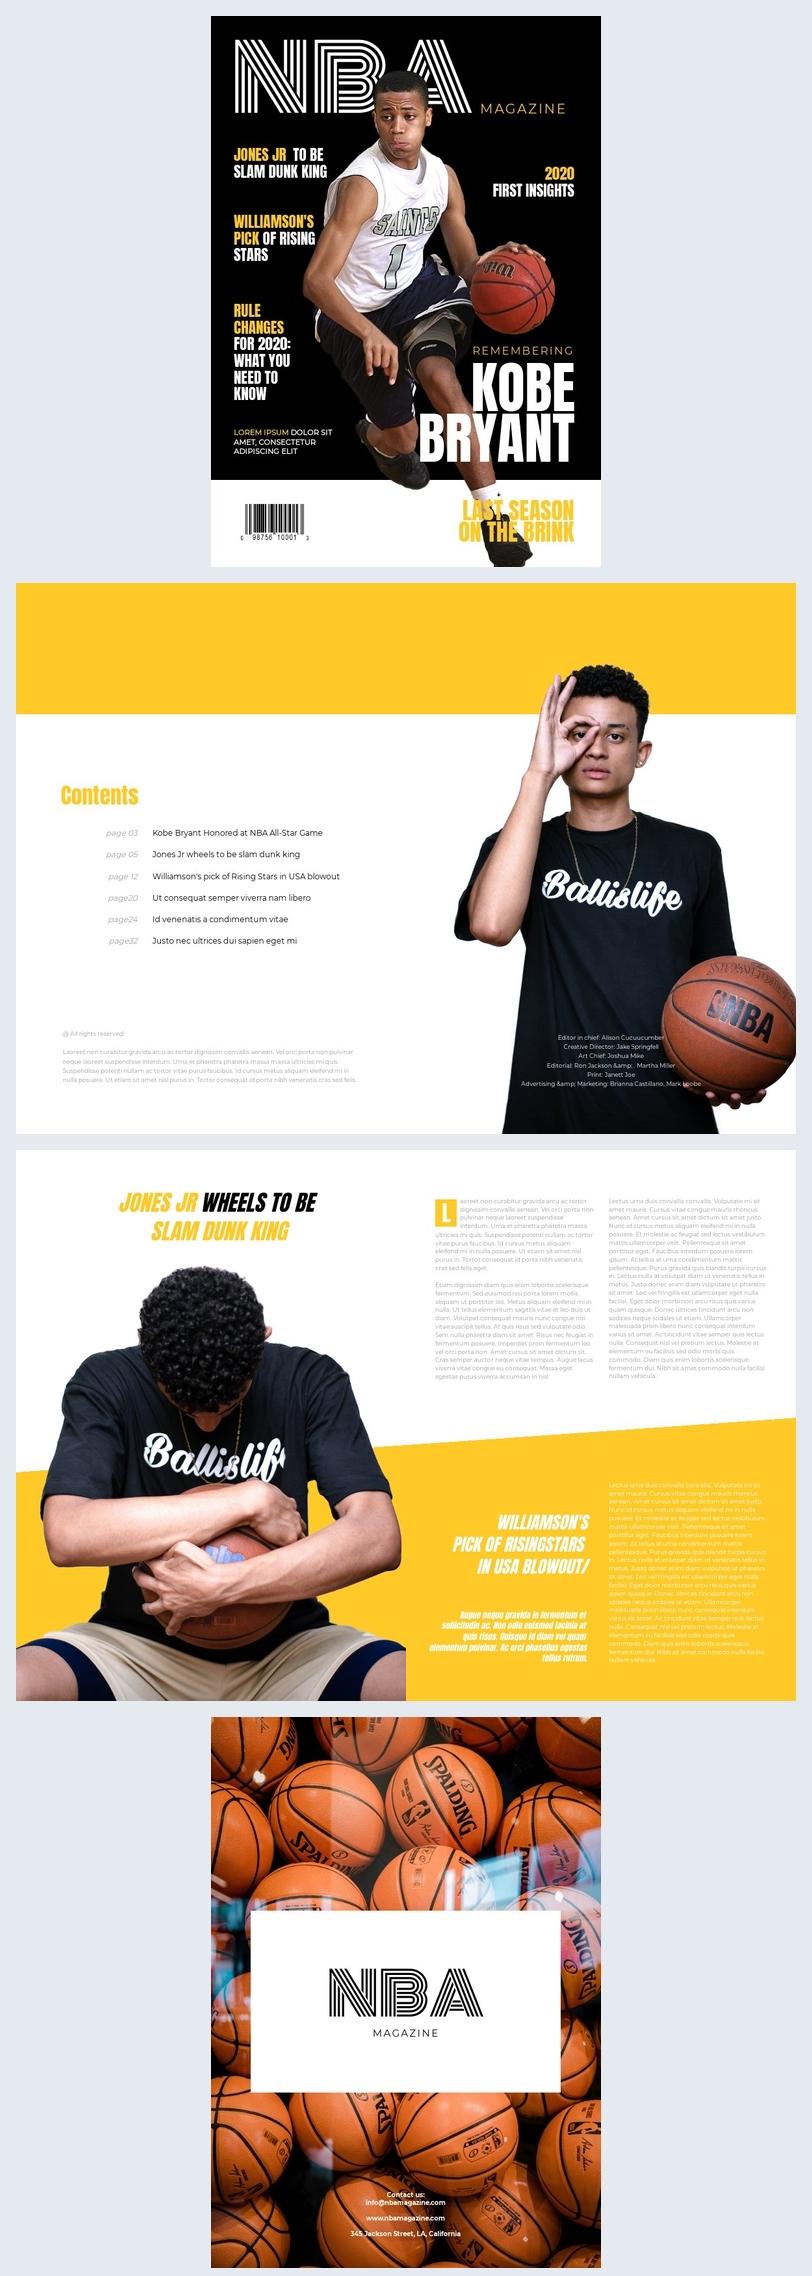 Basketball-Magazin-Vorlage